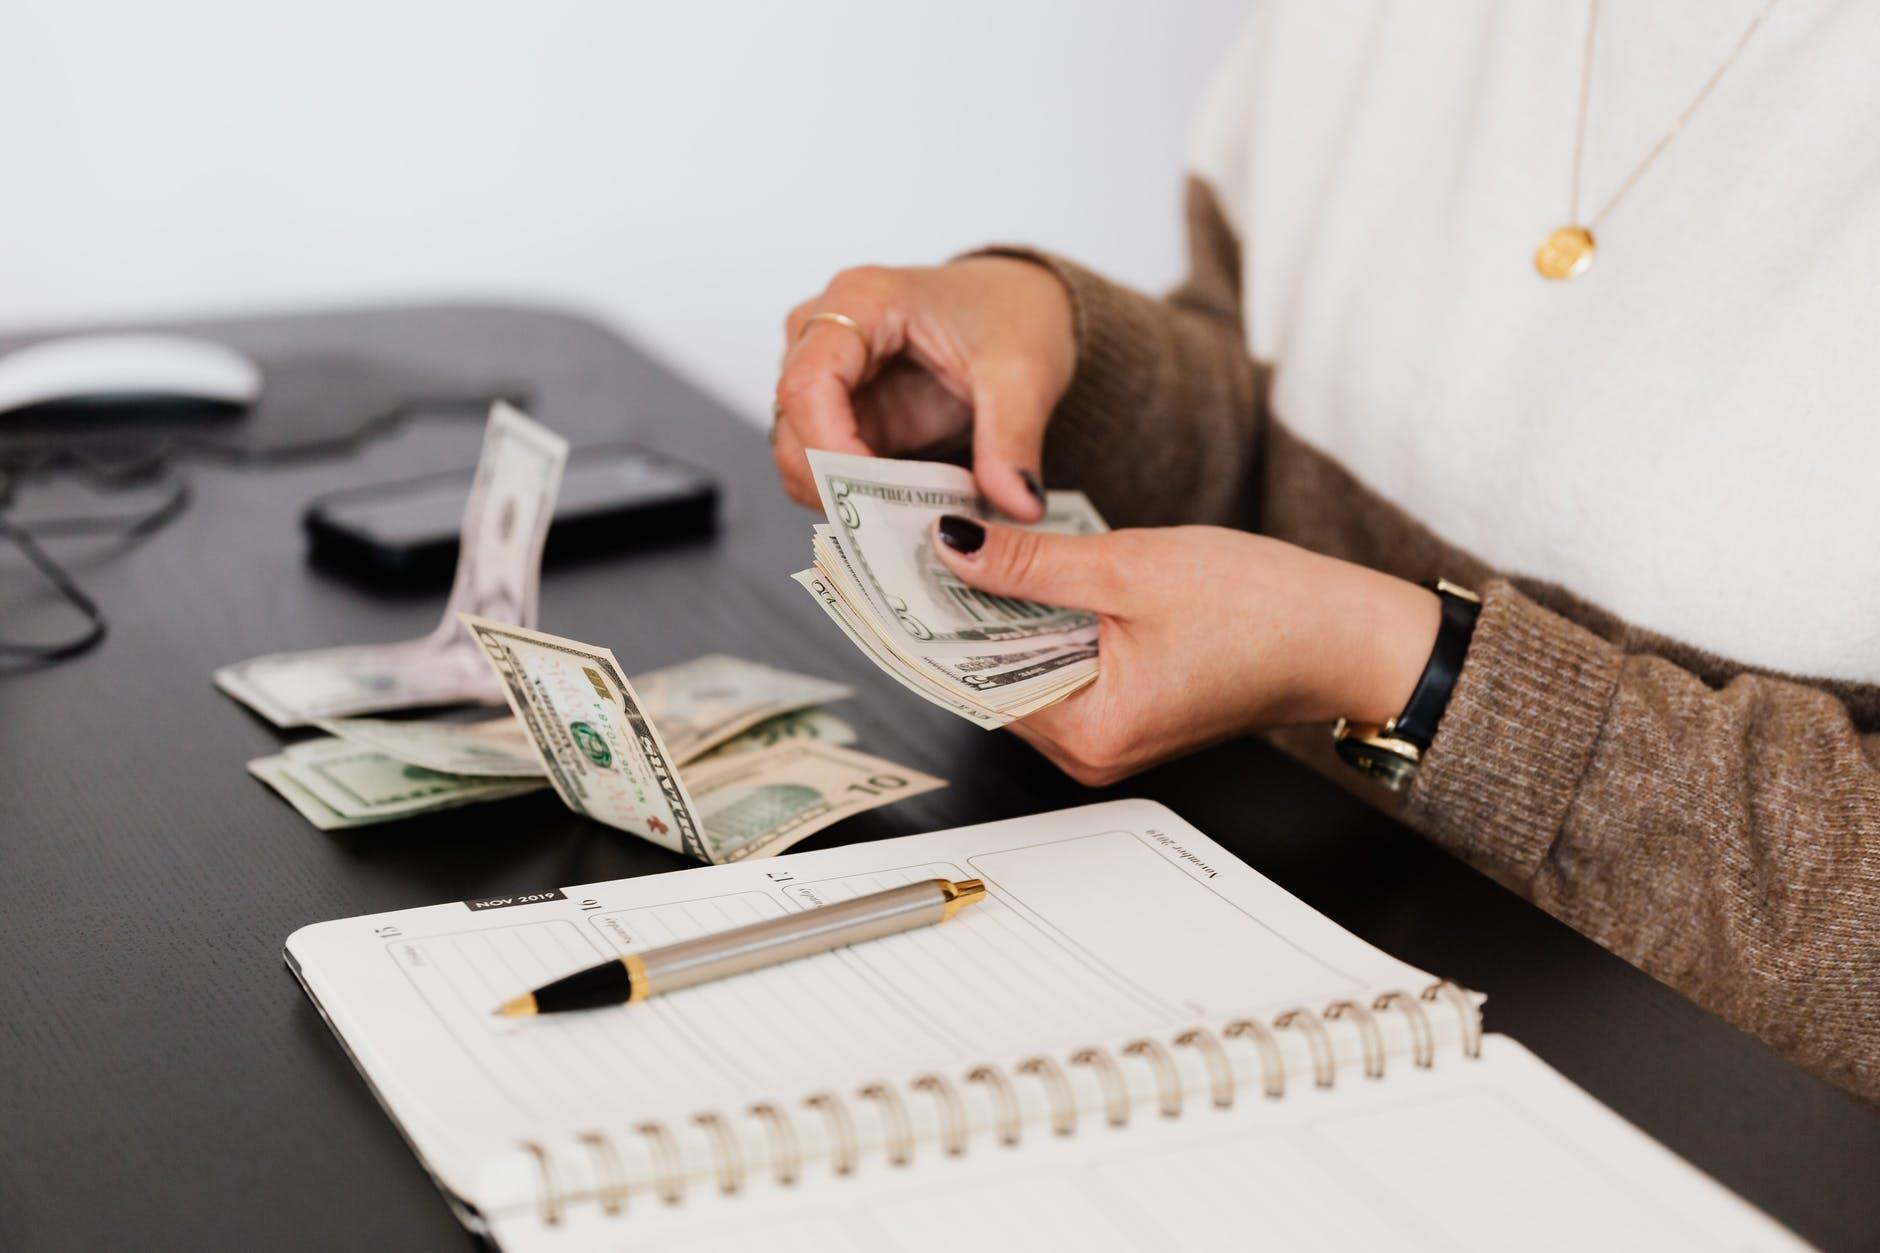 Realistic budgeting